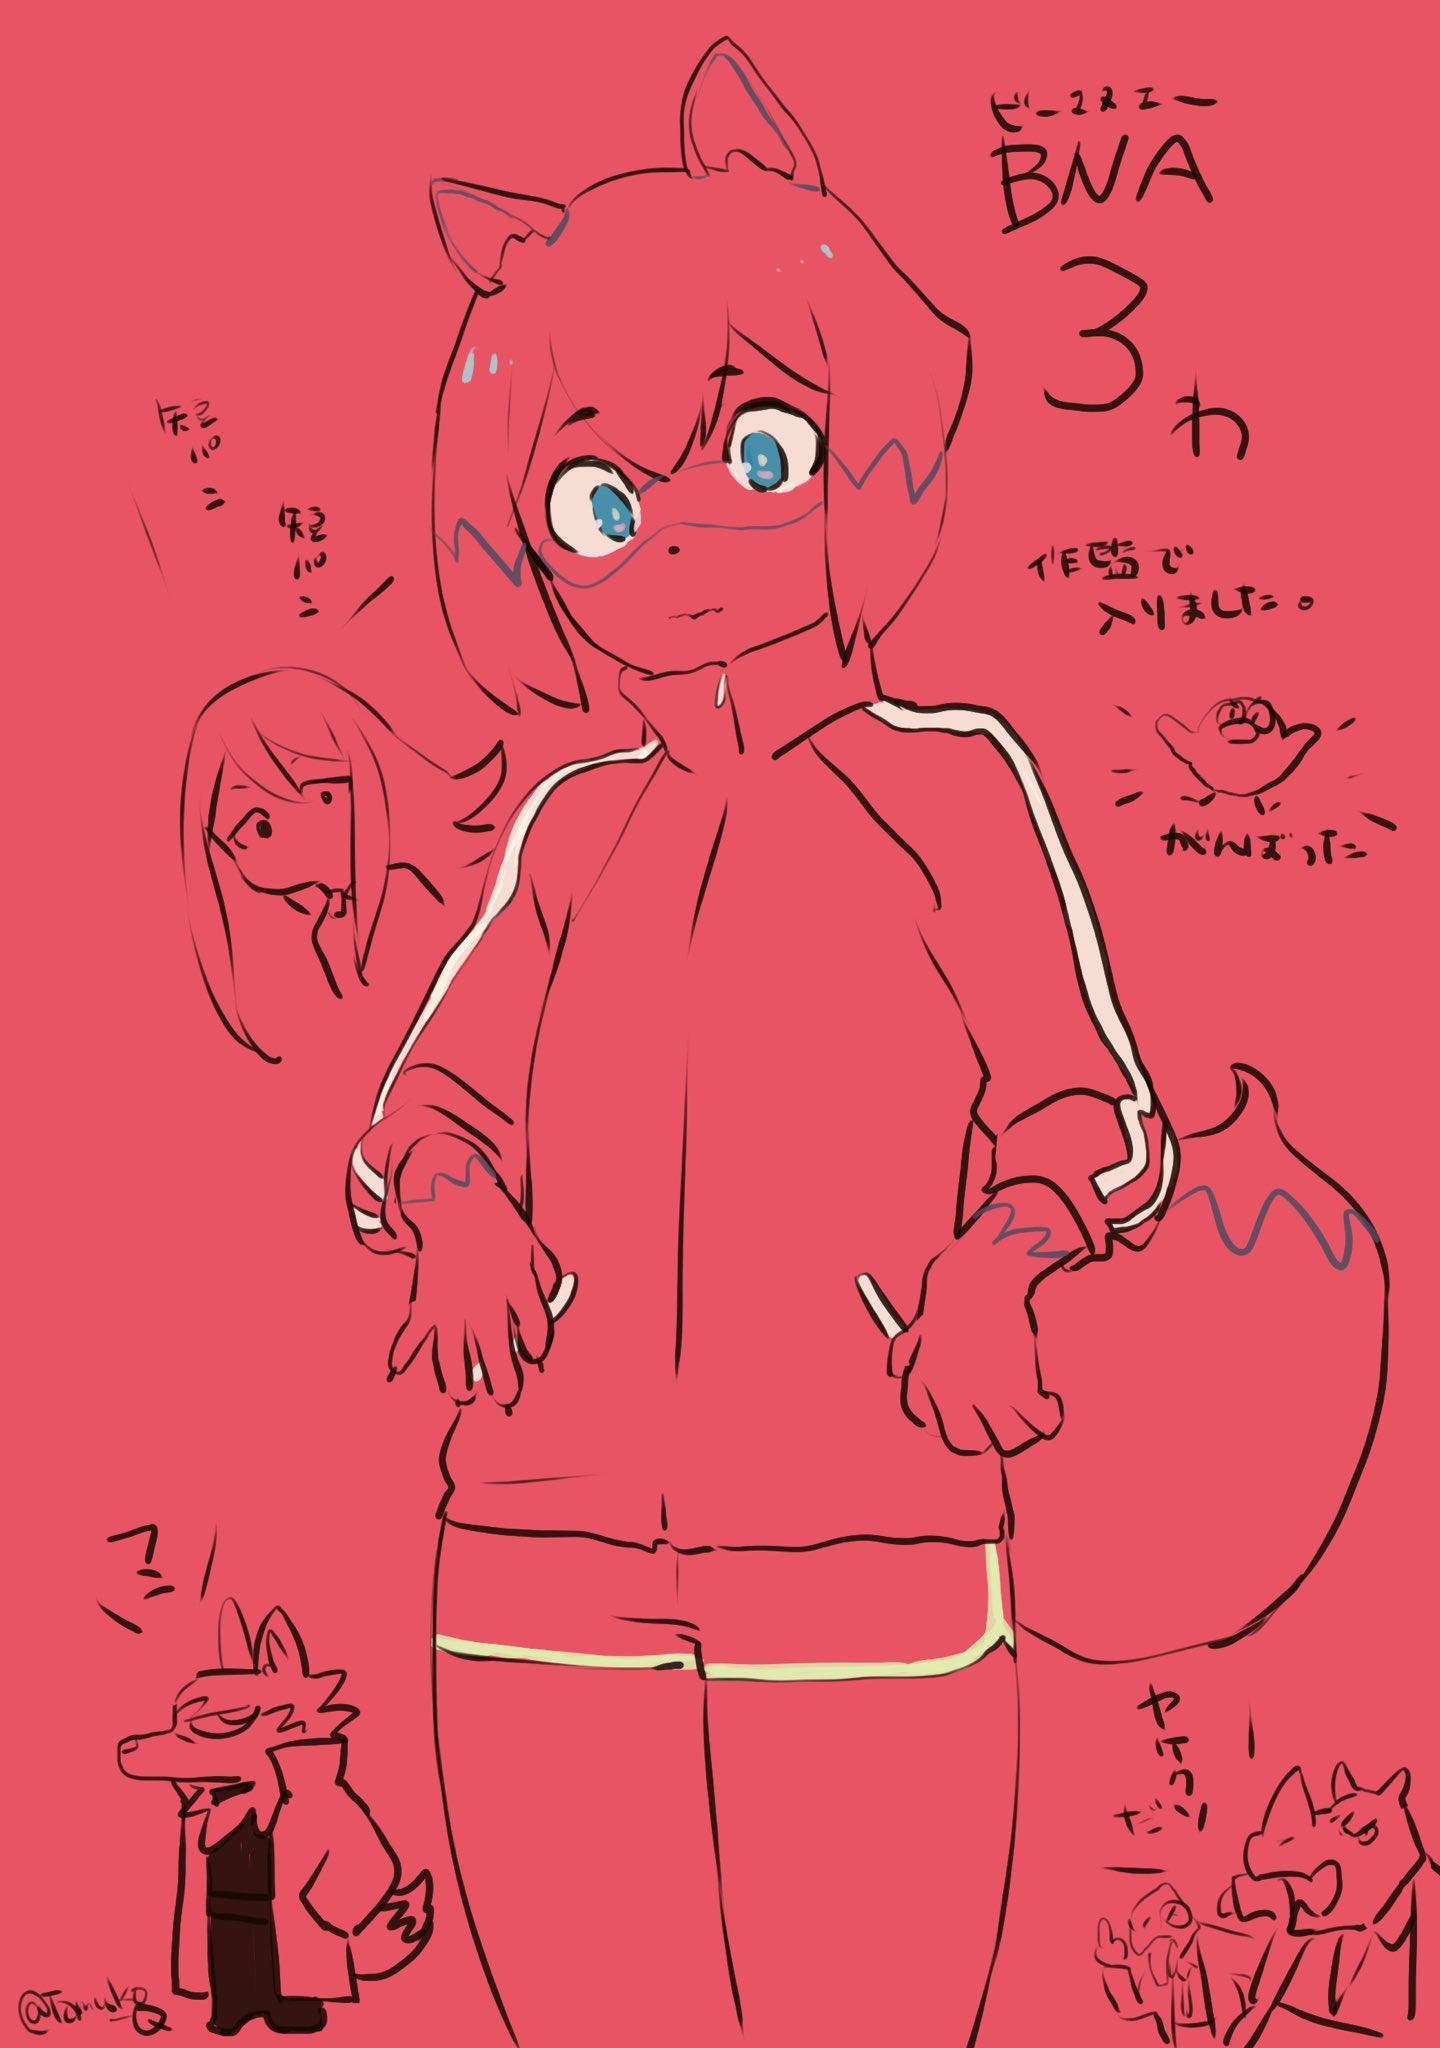 BNA 01x03 Eimi Tamura